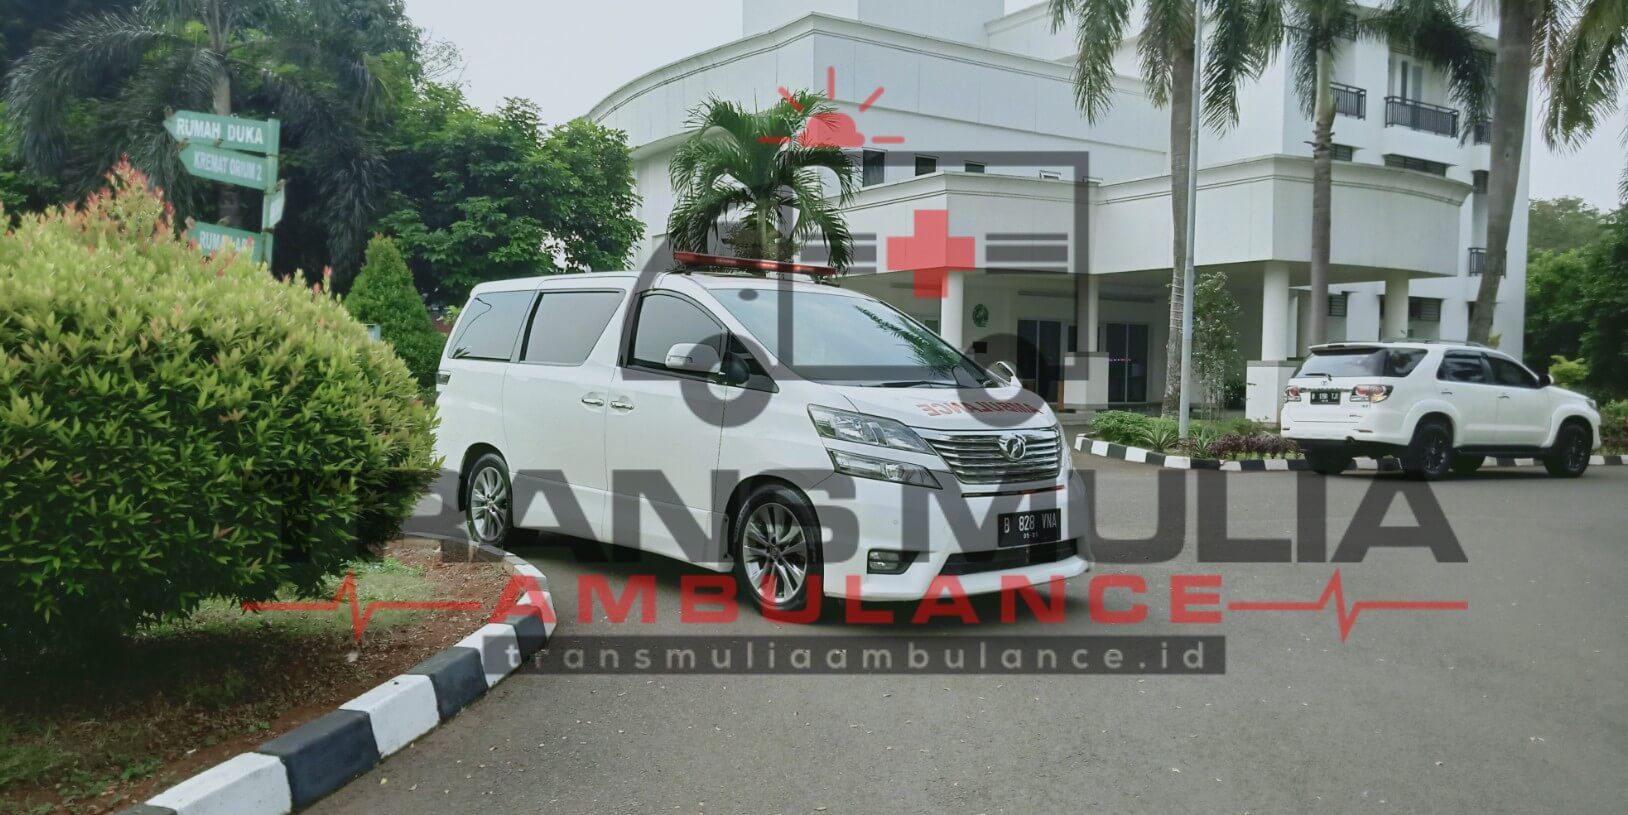 Rental Mobil Alphard Untuk Jenazah Transmulia Ambulance Id